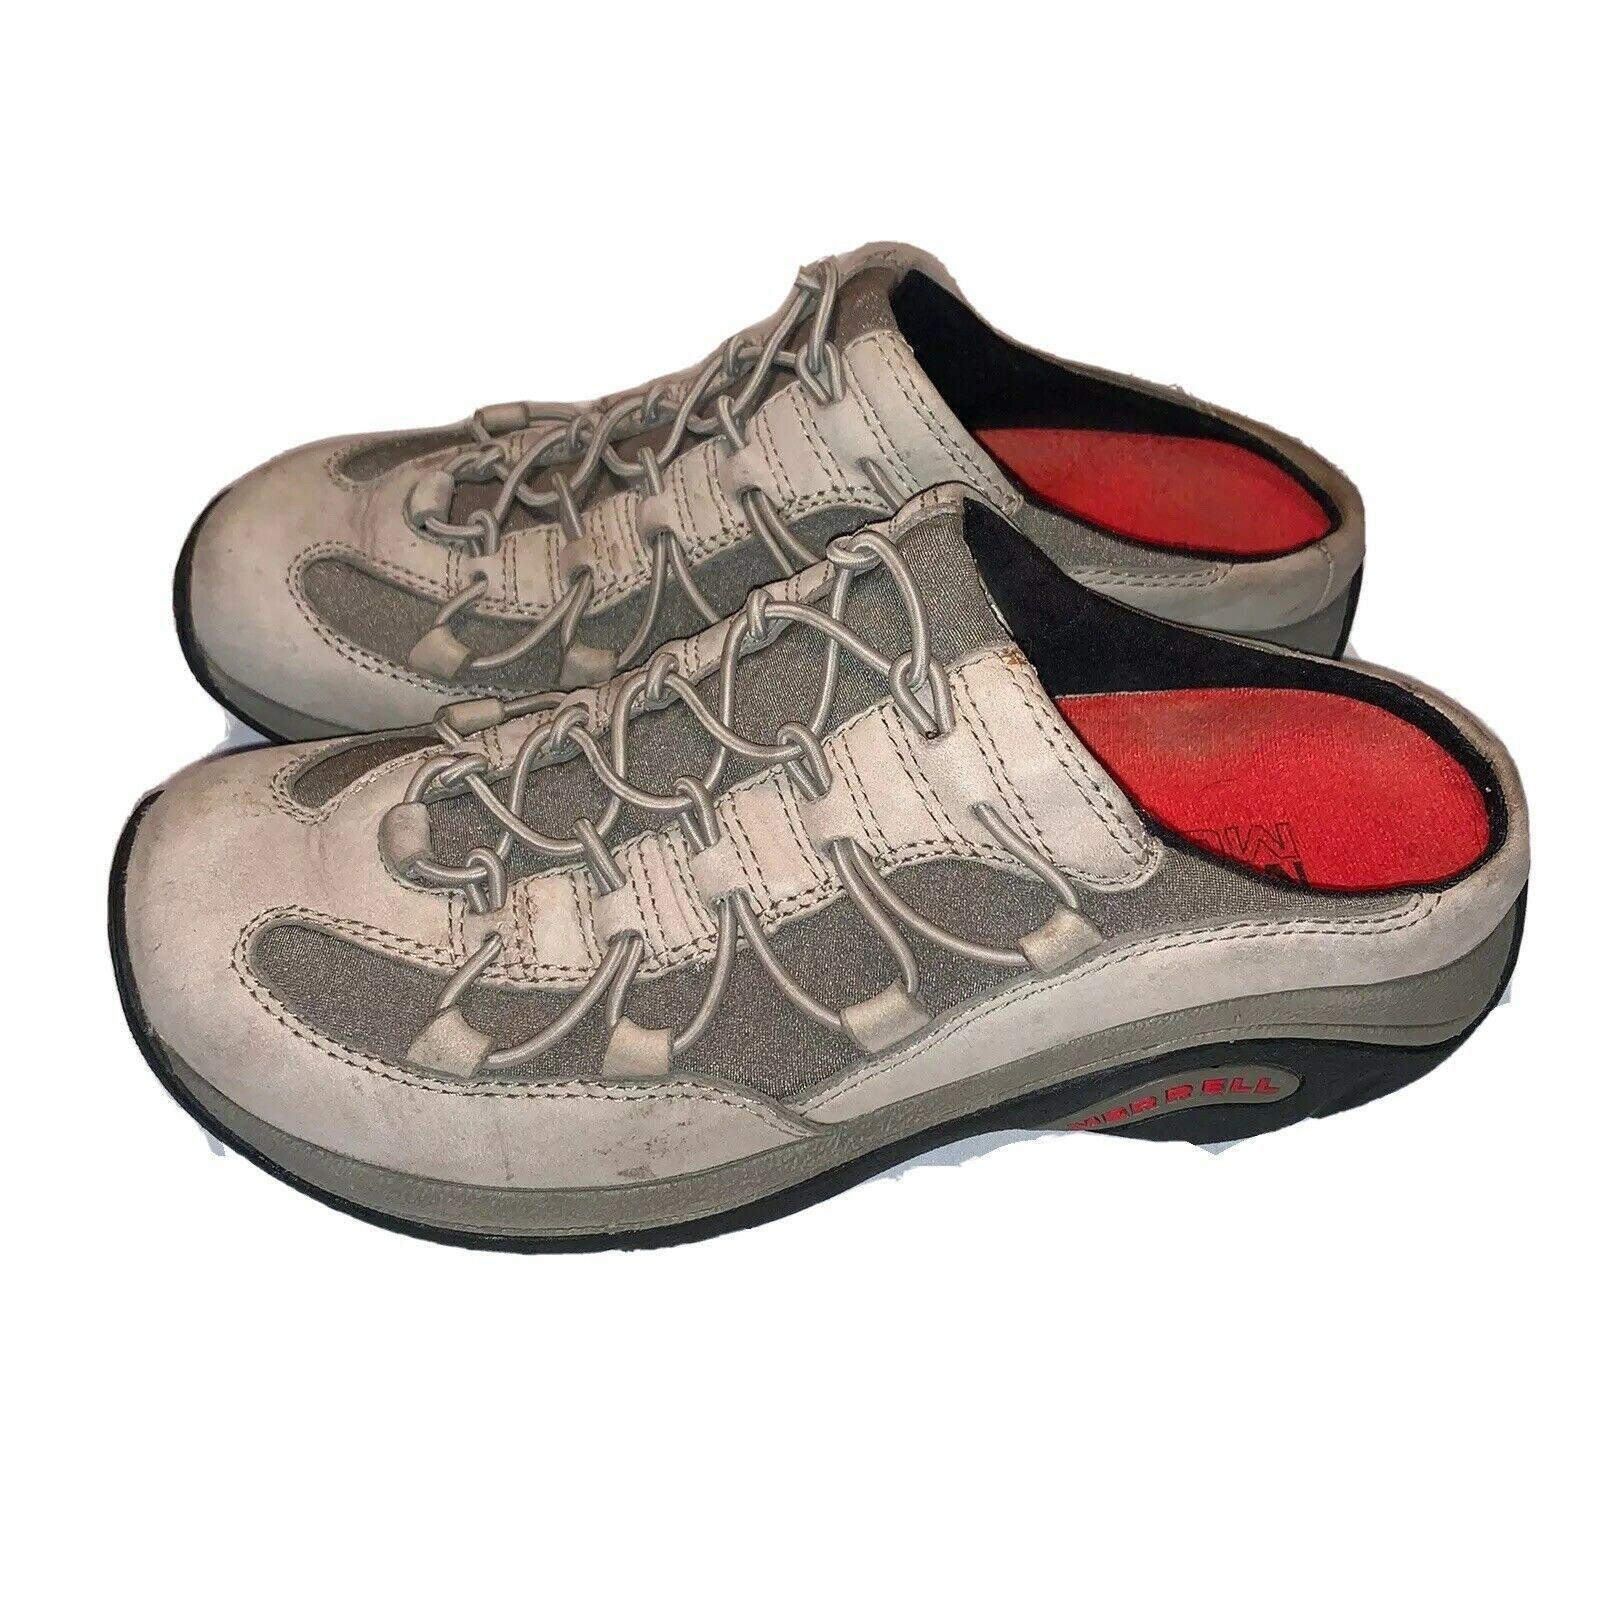 Merrell Womens 7.5 Cargo Net Slide Taupe Air Cushion Mules Clogs Comfort Shoe - $16.82